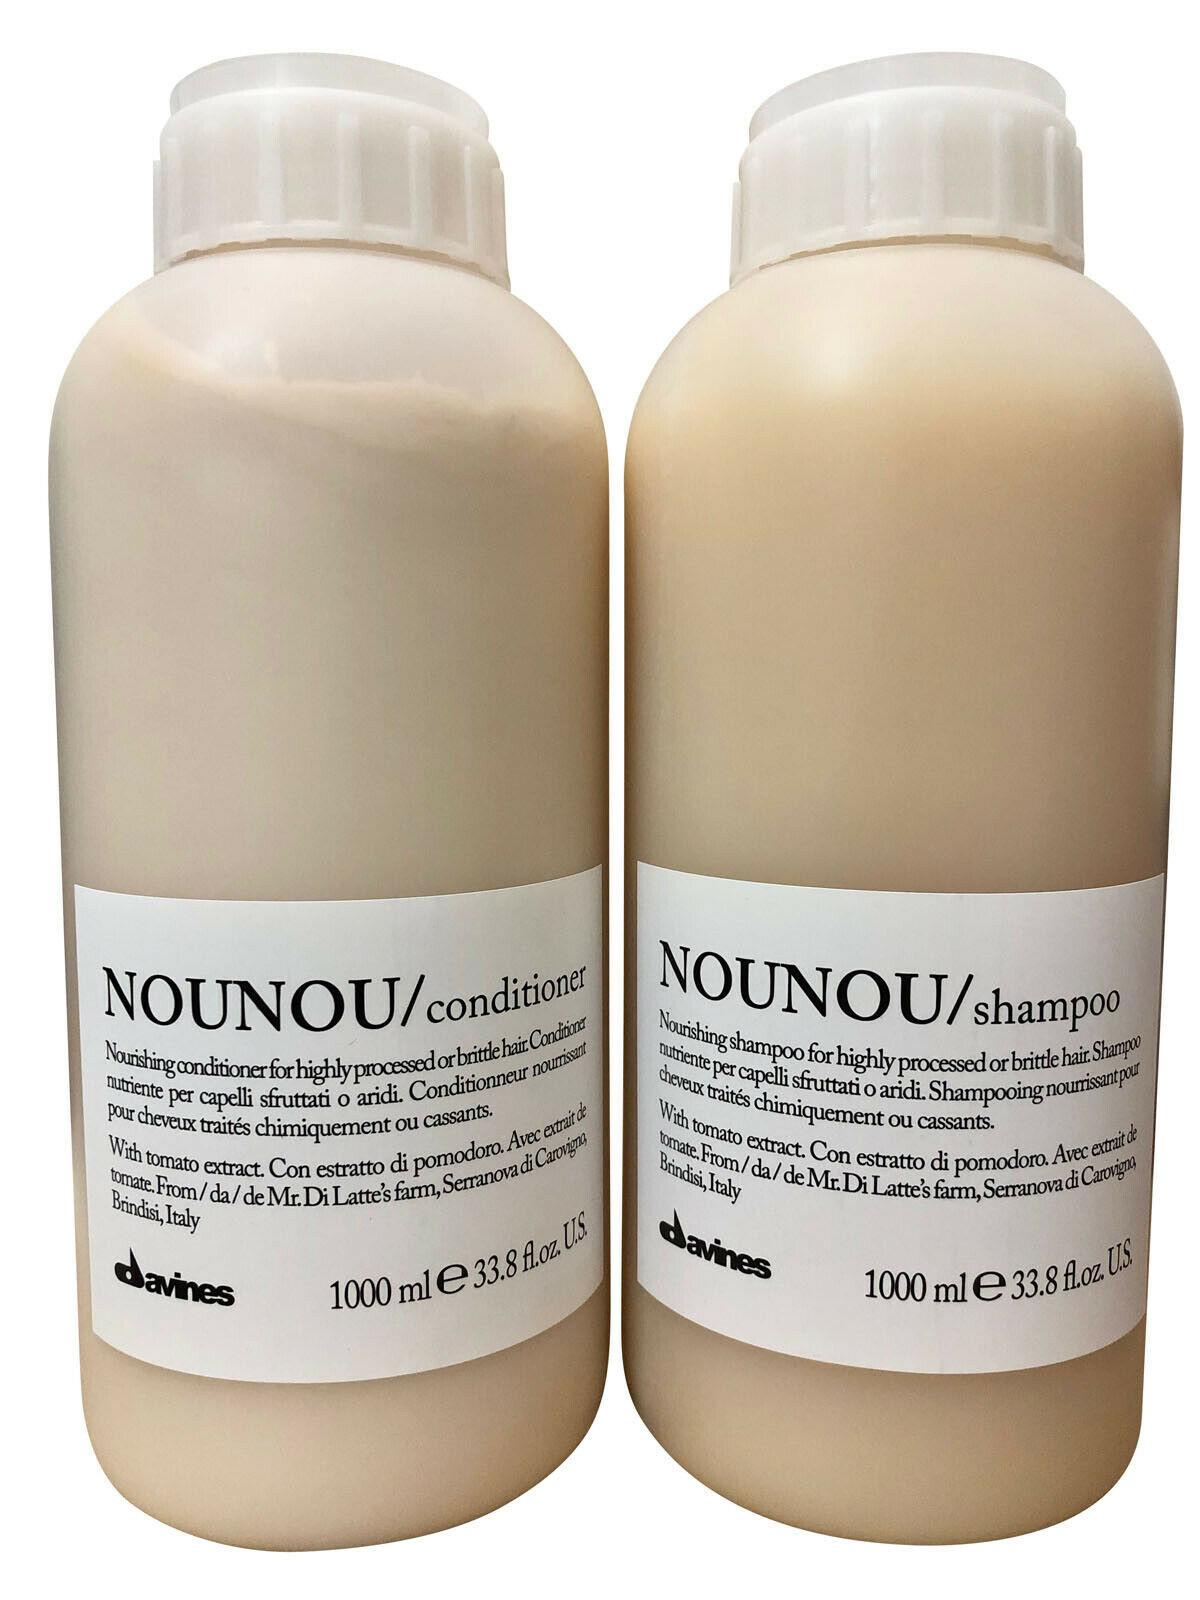 Davines Nounou Nourishing Shampoo & Conditioner Set 33.8 OZ - $190.11